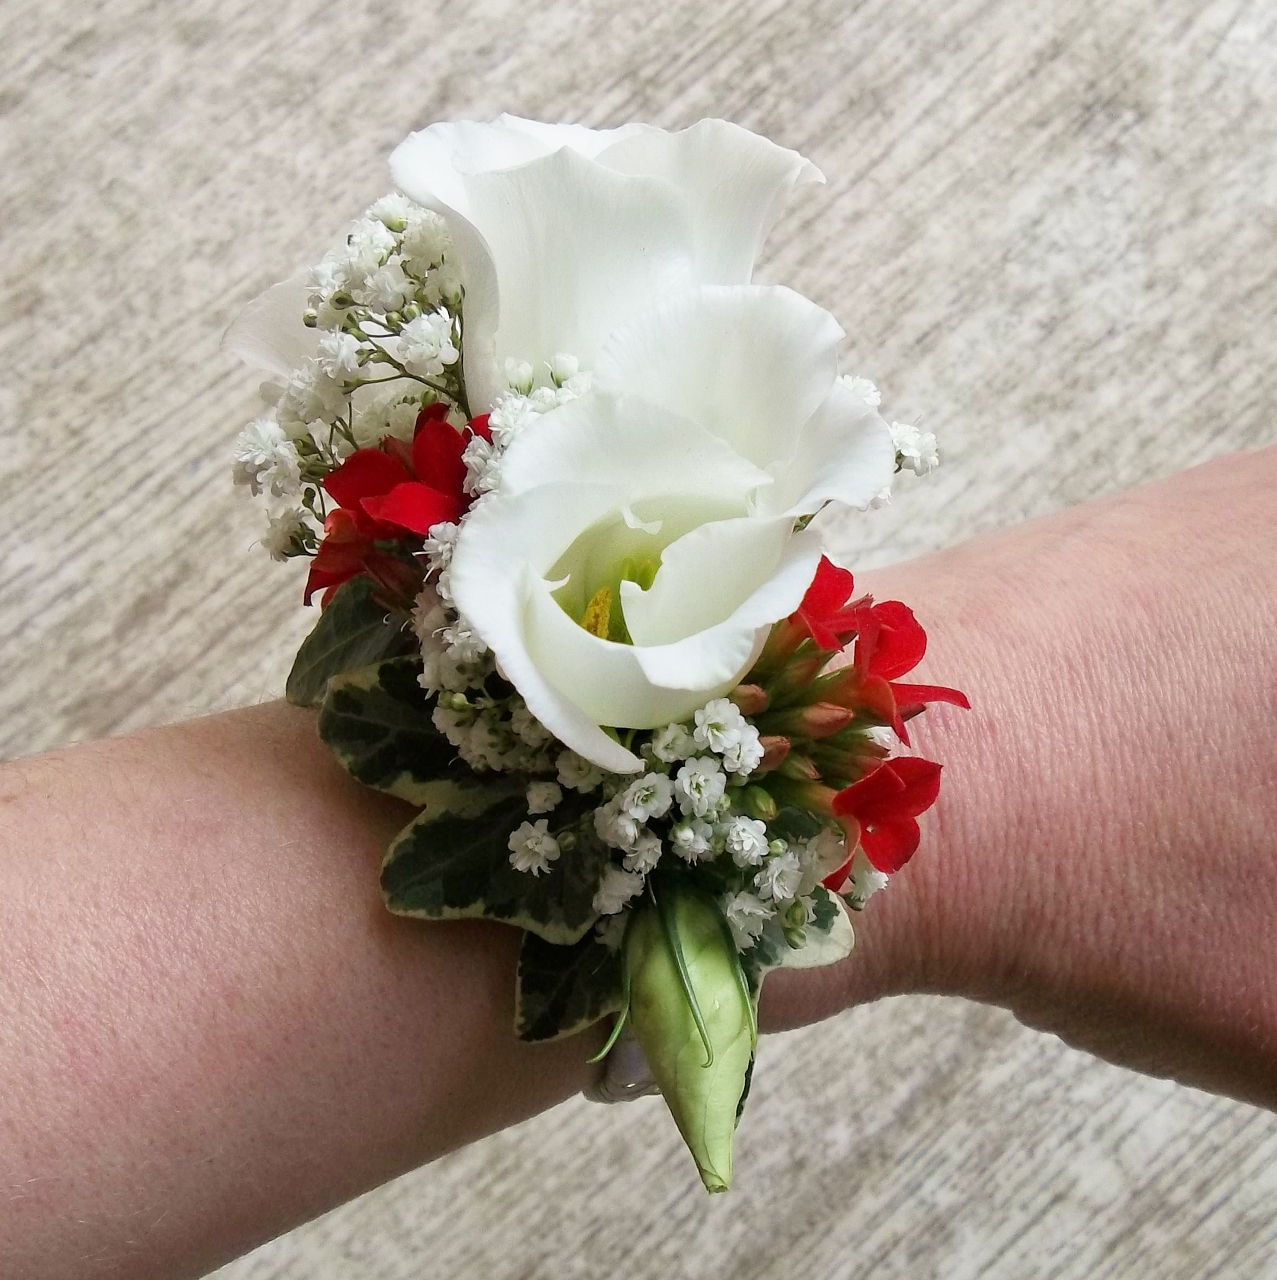 wrist%20corsage%20red%20white%20(1277x1280)